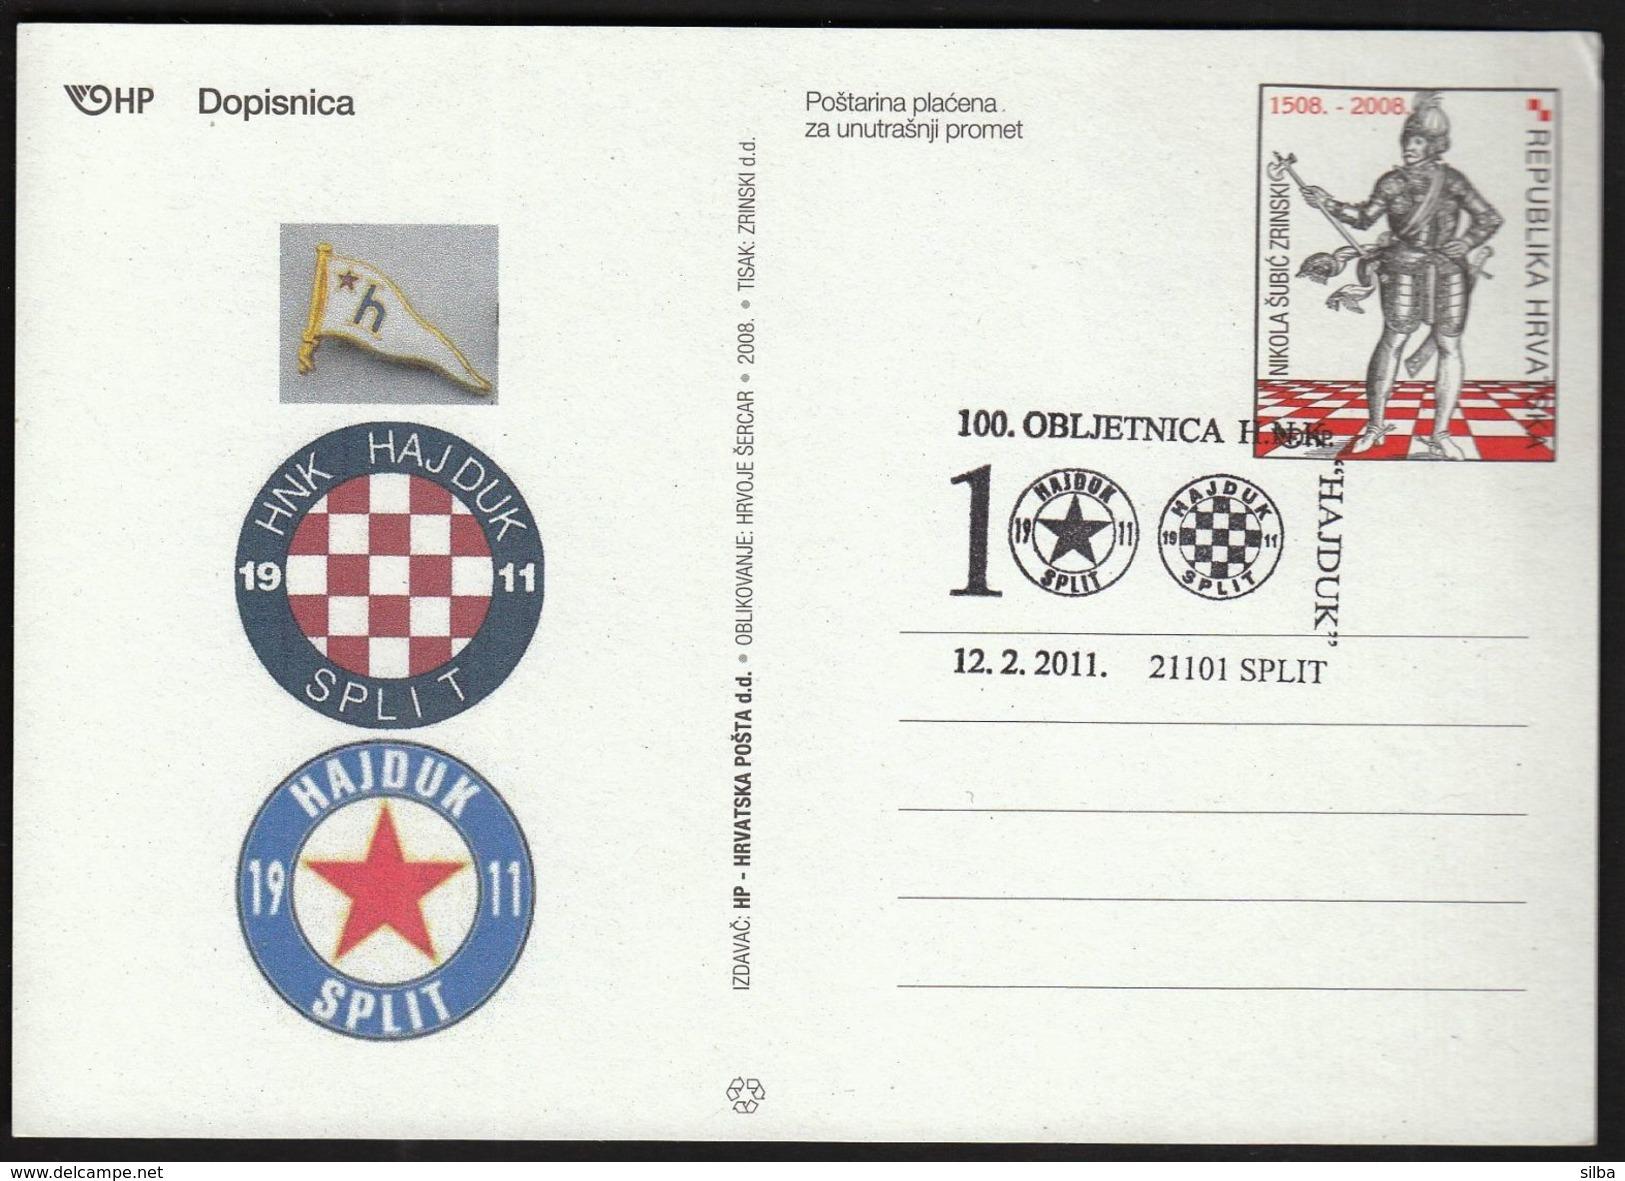 Croatia Split 2011 / 100th Anniversary Of HNK Hajduk / Football - Equipos Famosos